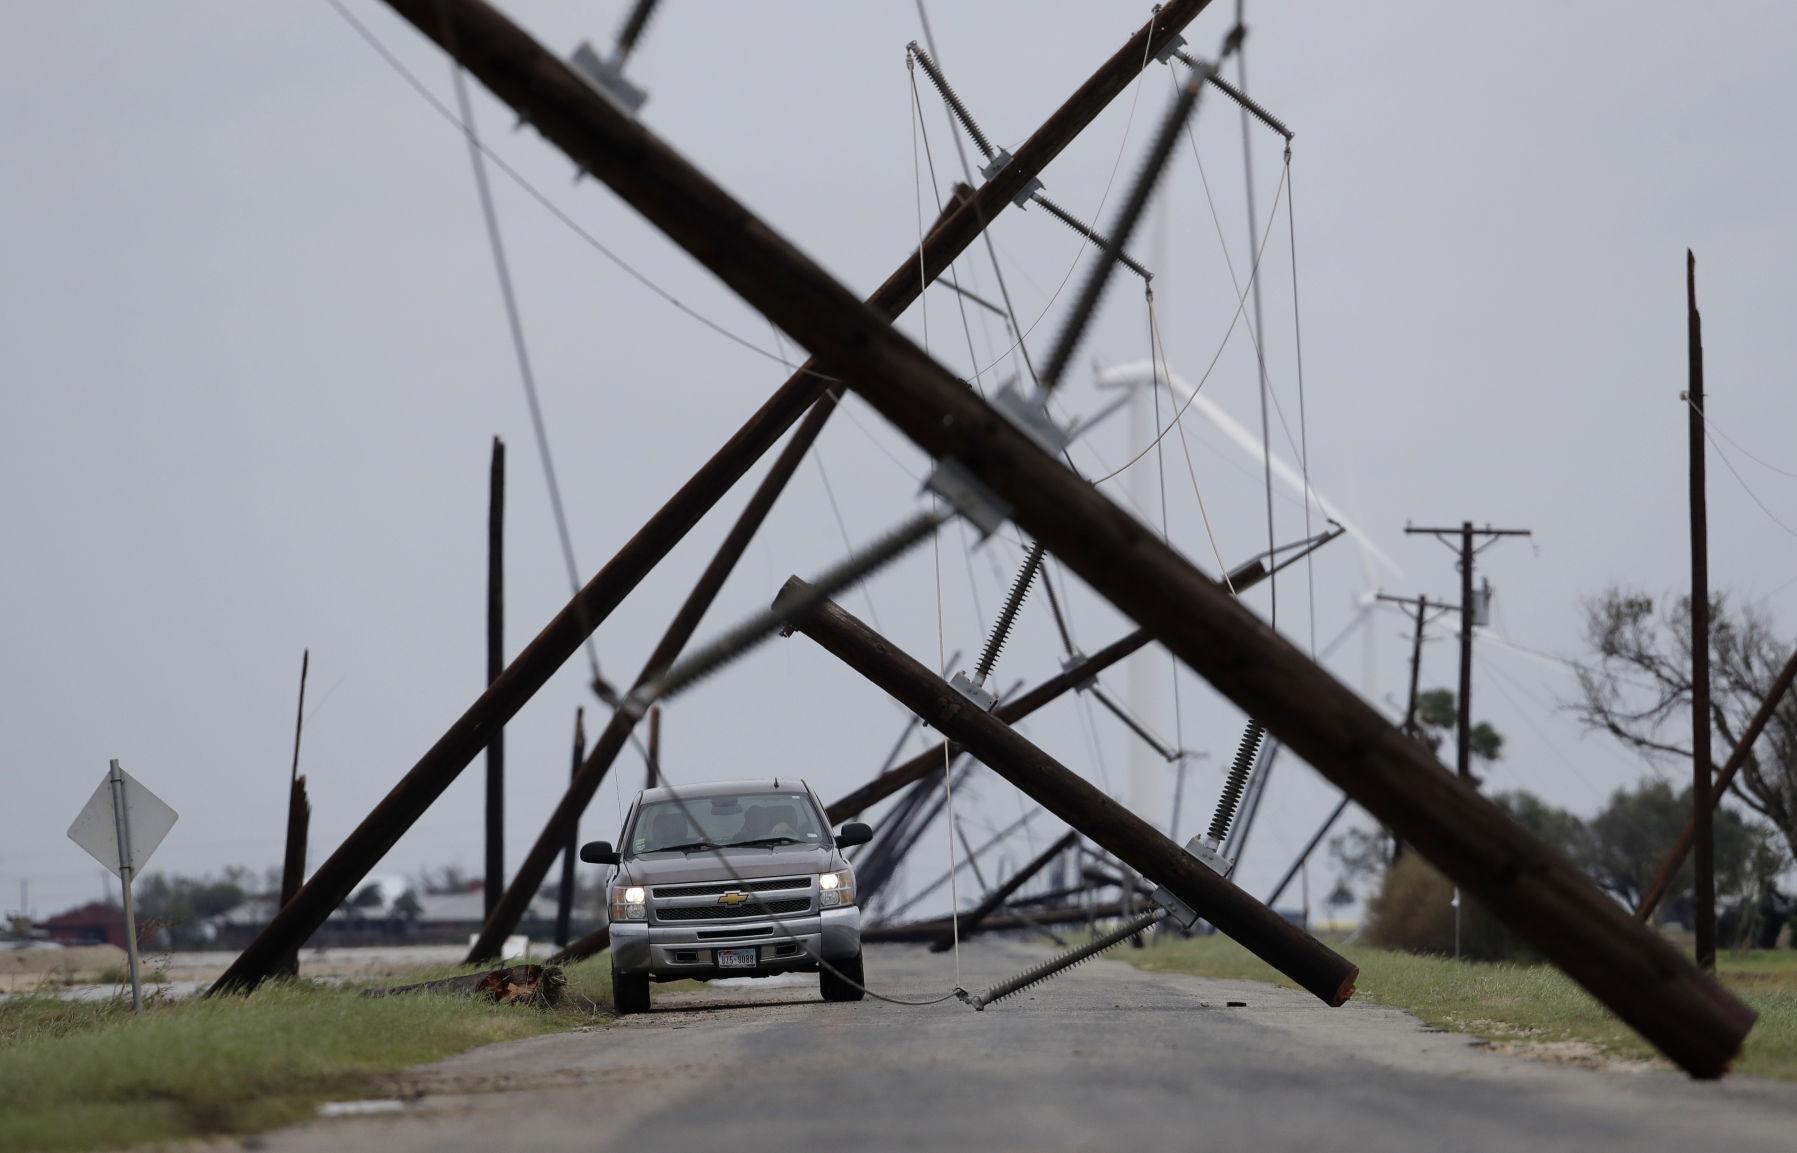 Torrential rain and 'catastrophic flooding' to hit Texas — Hurricane Harvey